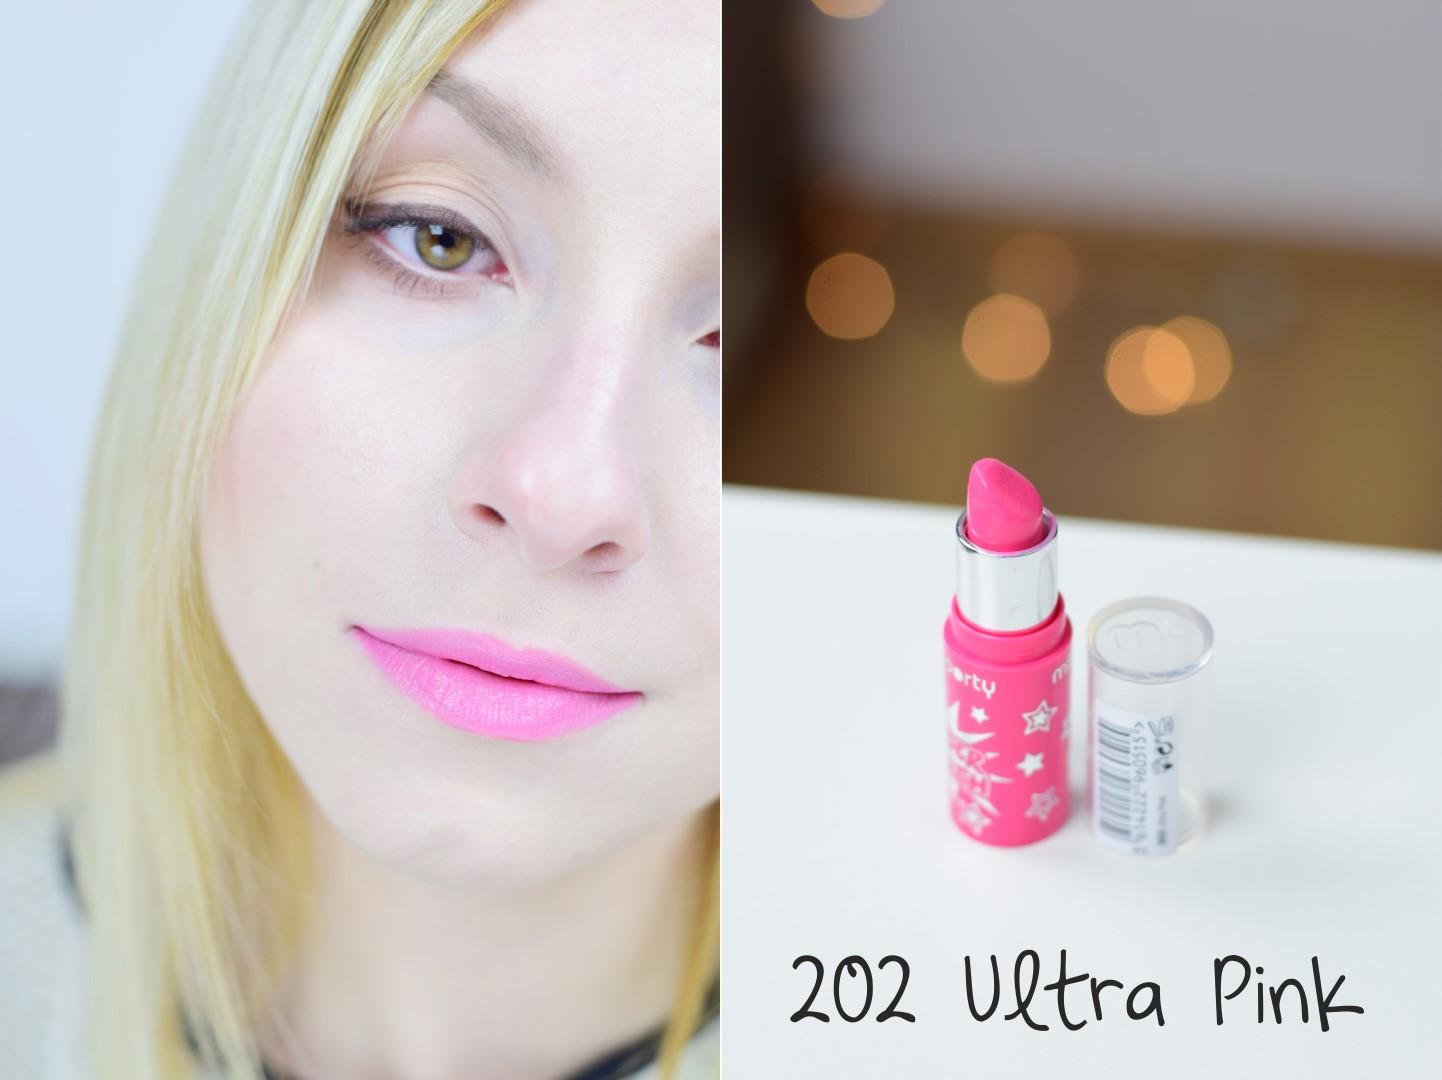 miss_sporty_wonder_smooth_blog_opinia_recenzja_swatche_ultra_pink_202